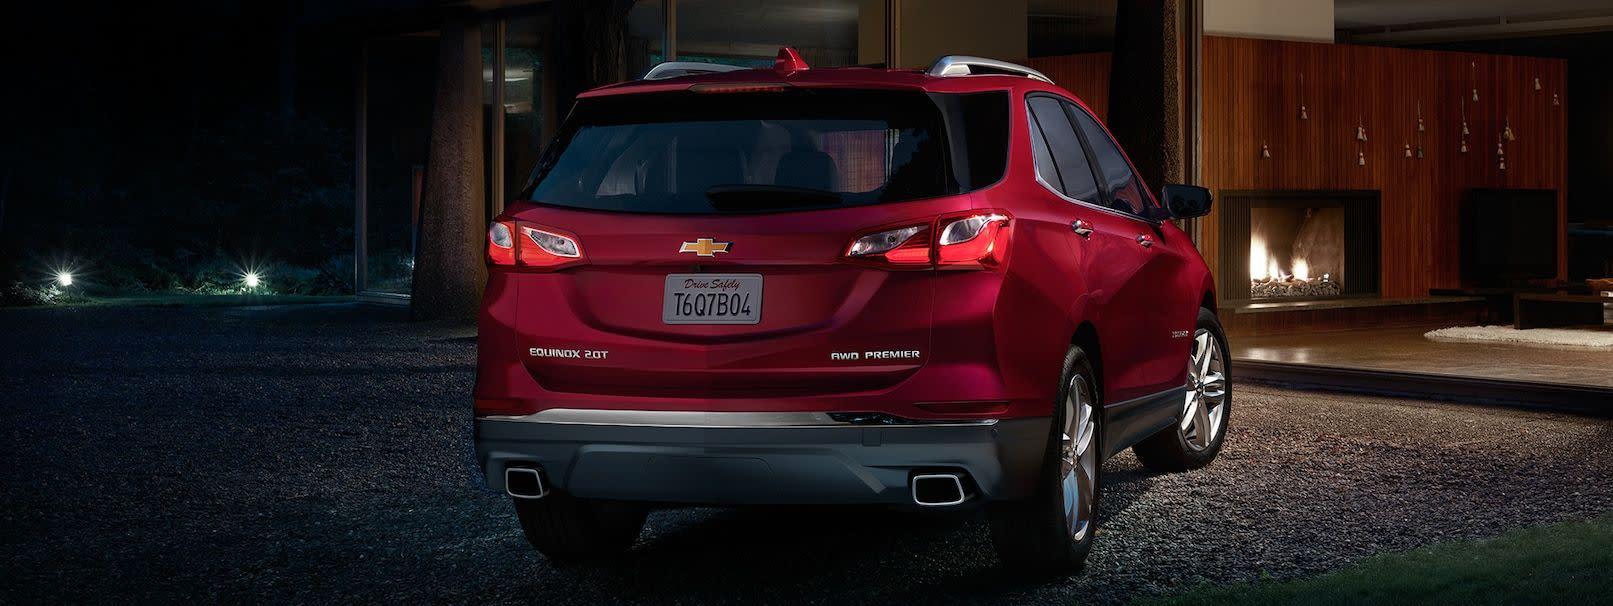 2020 Chevrolet Equinox for Sale near Lapeer, MI